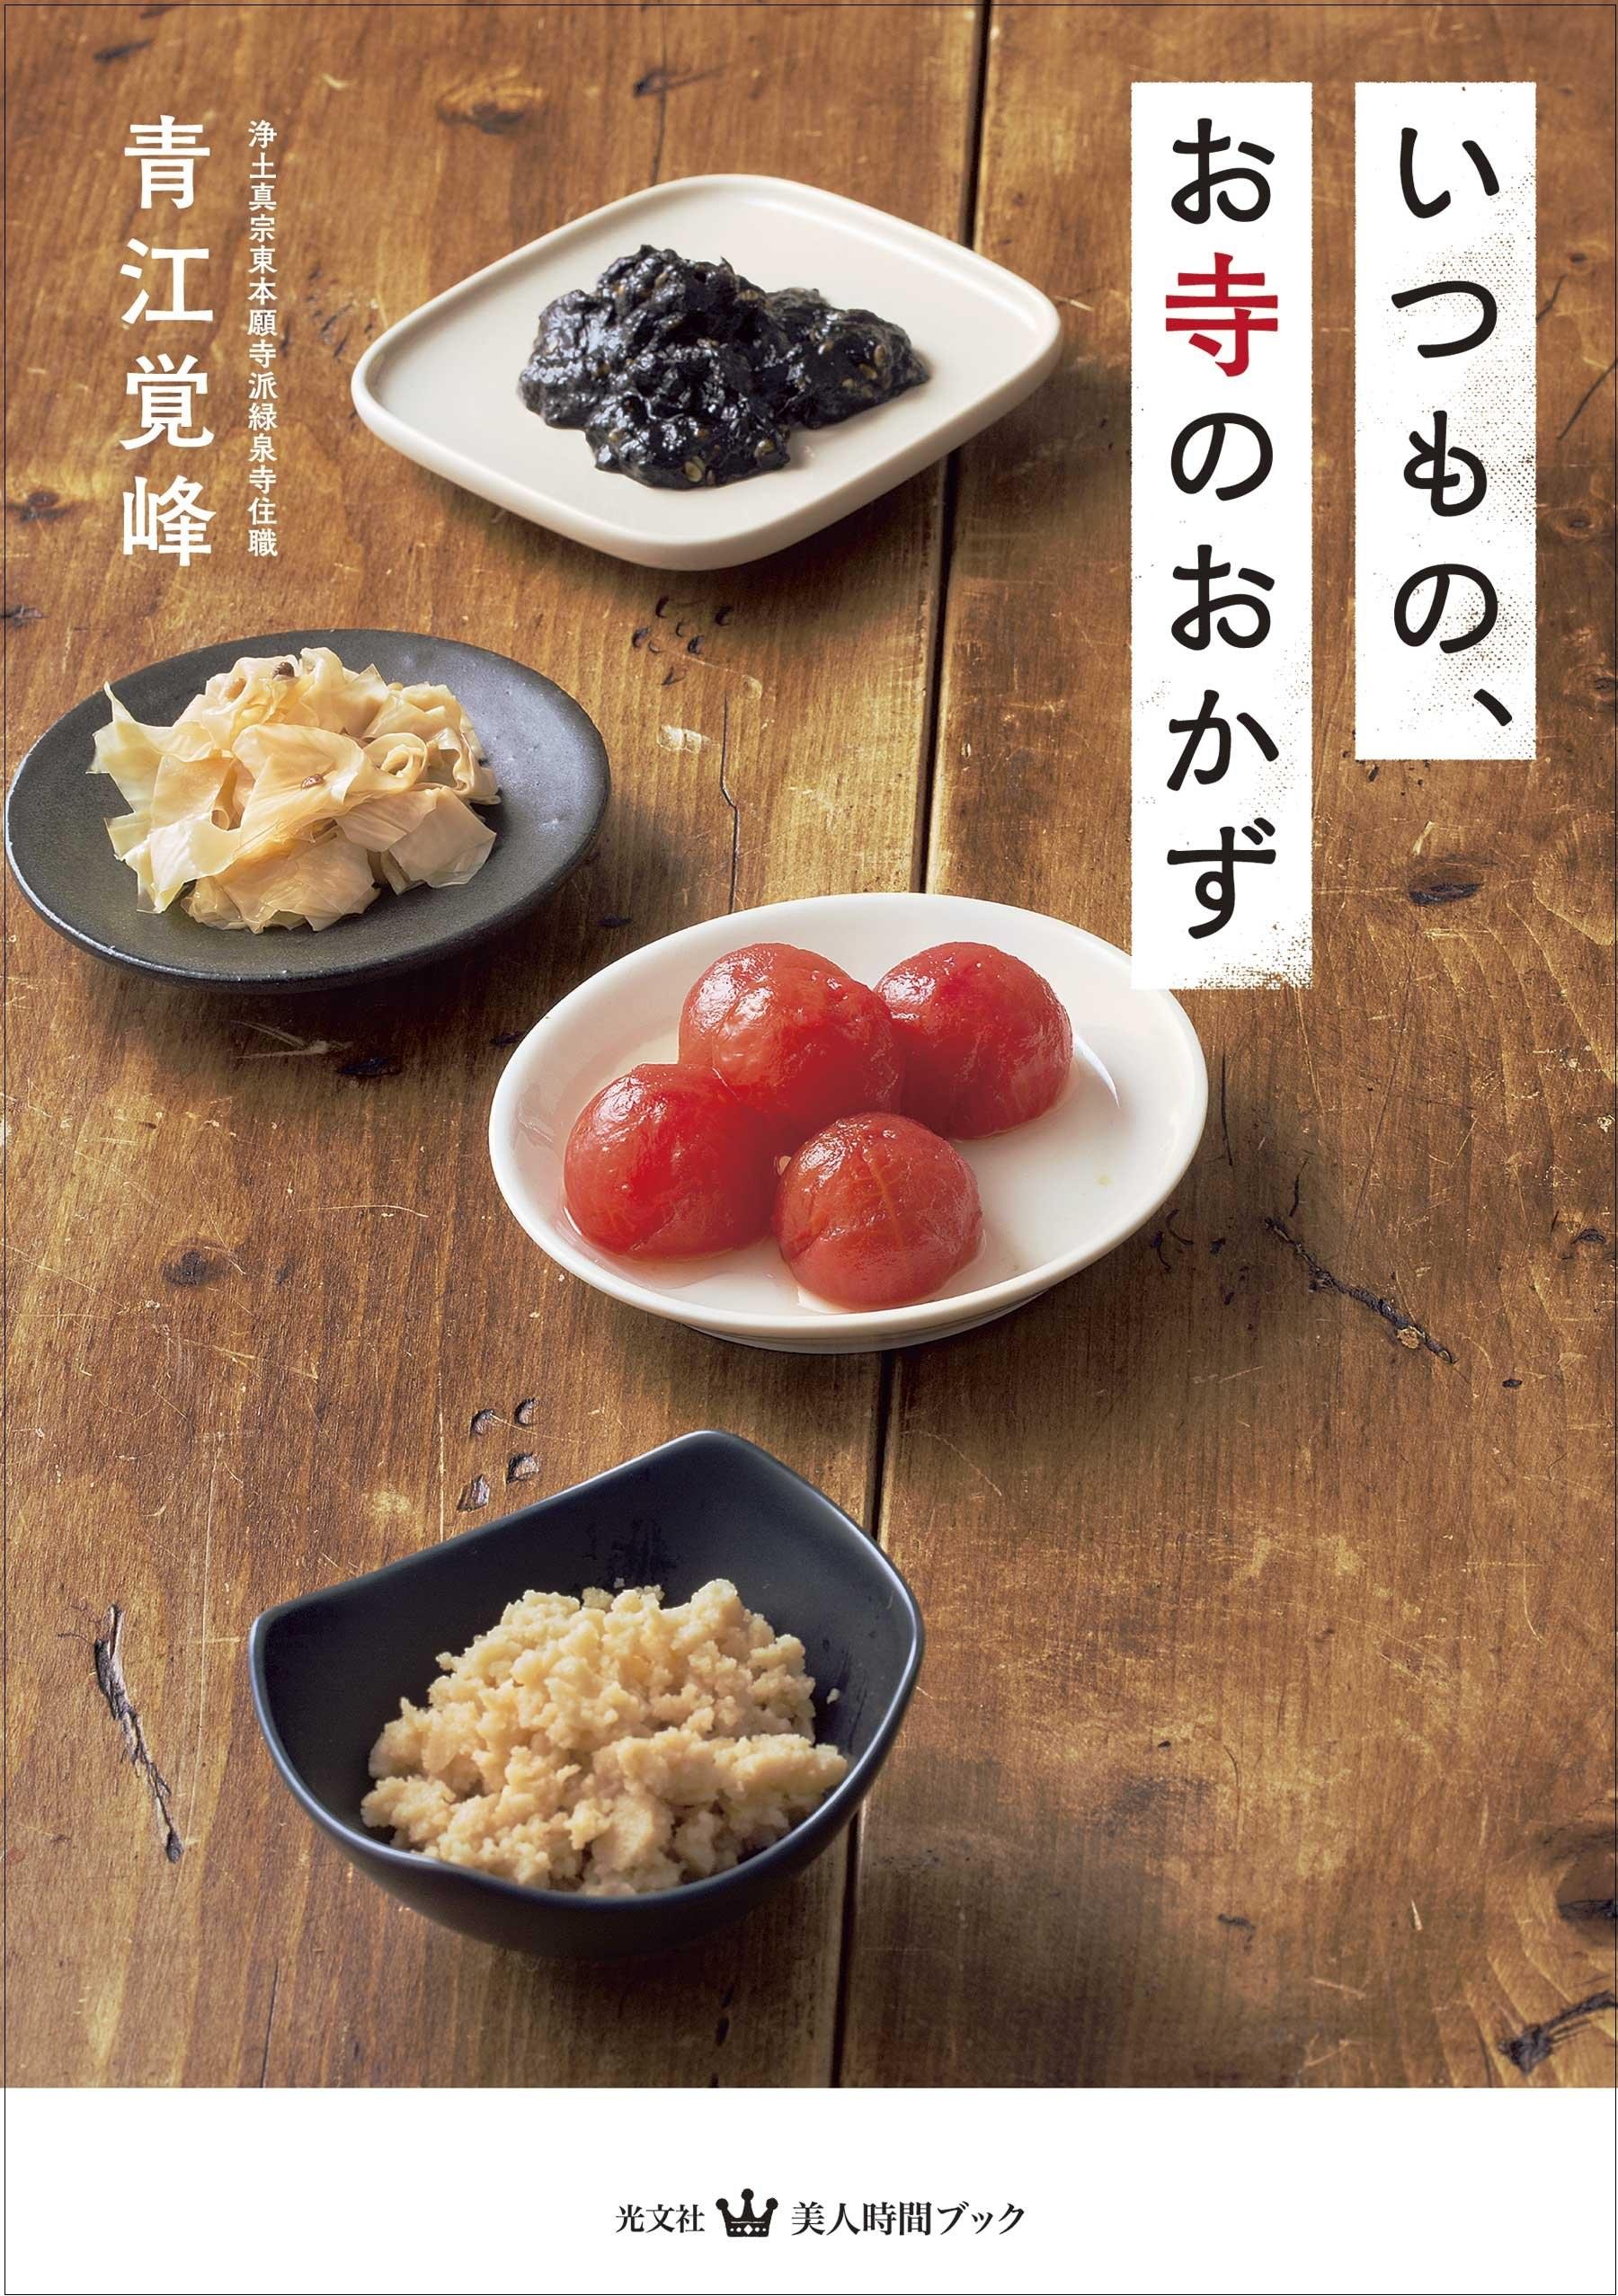 Temple Cuisine